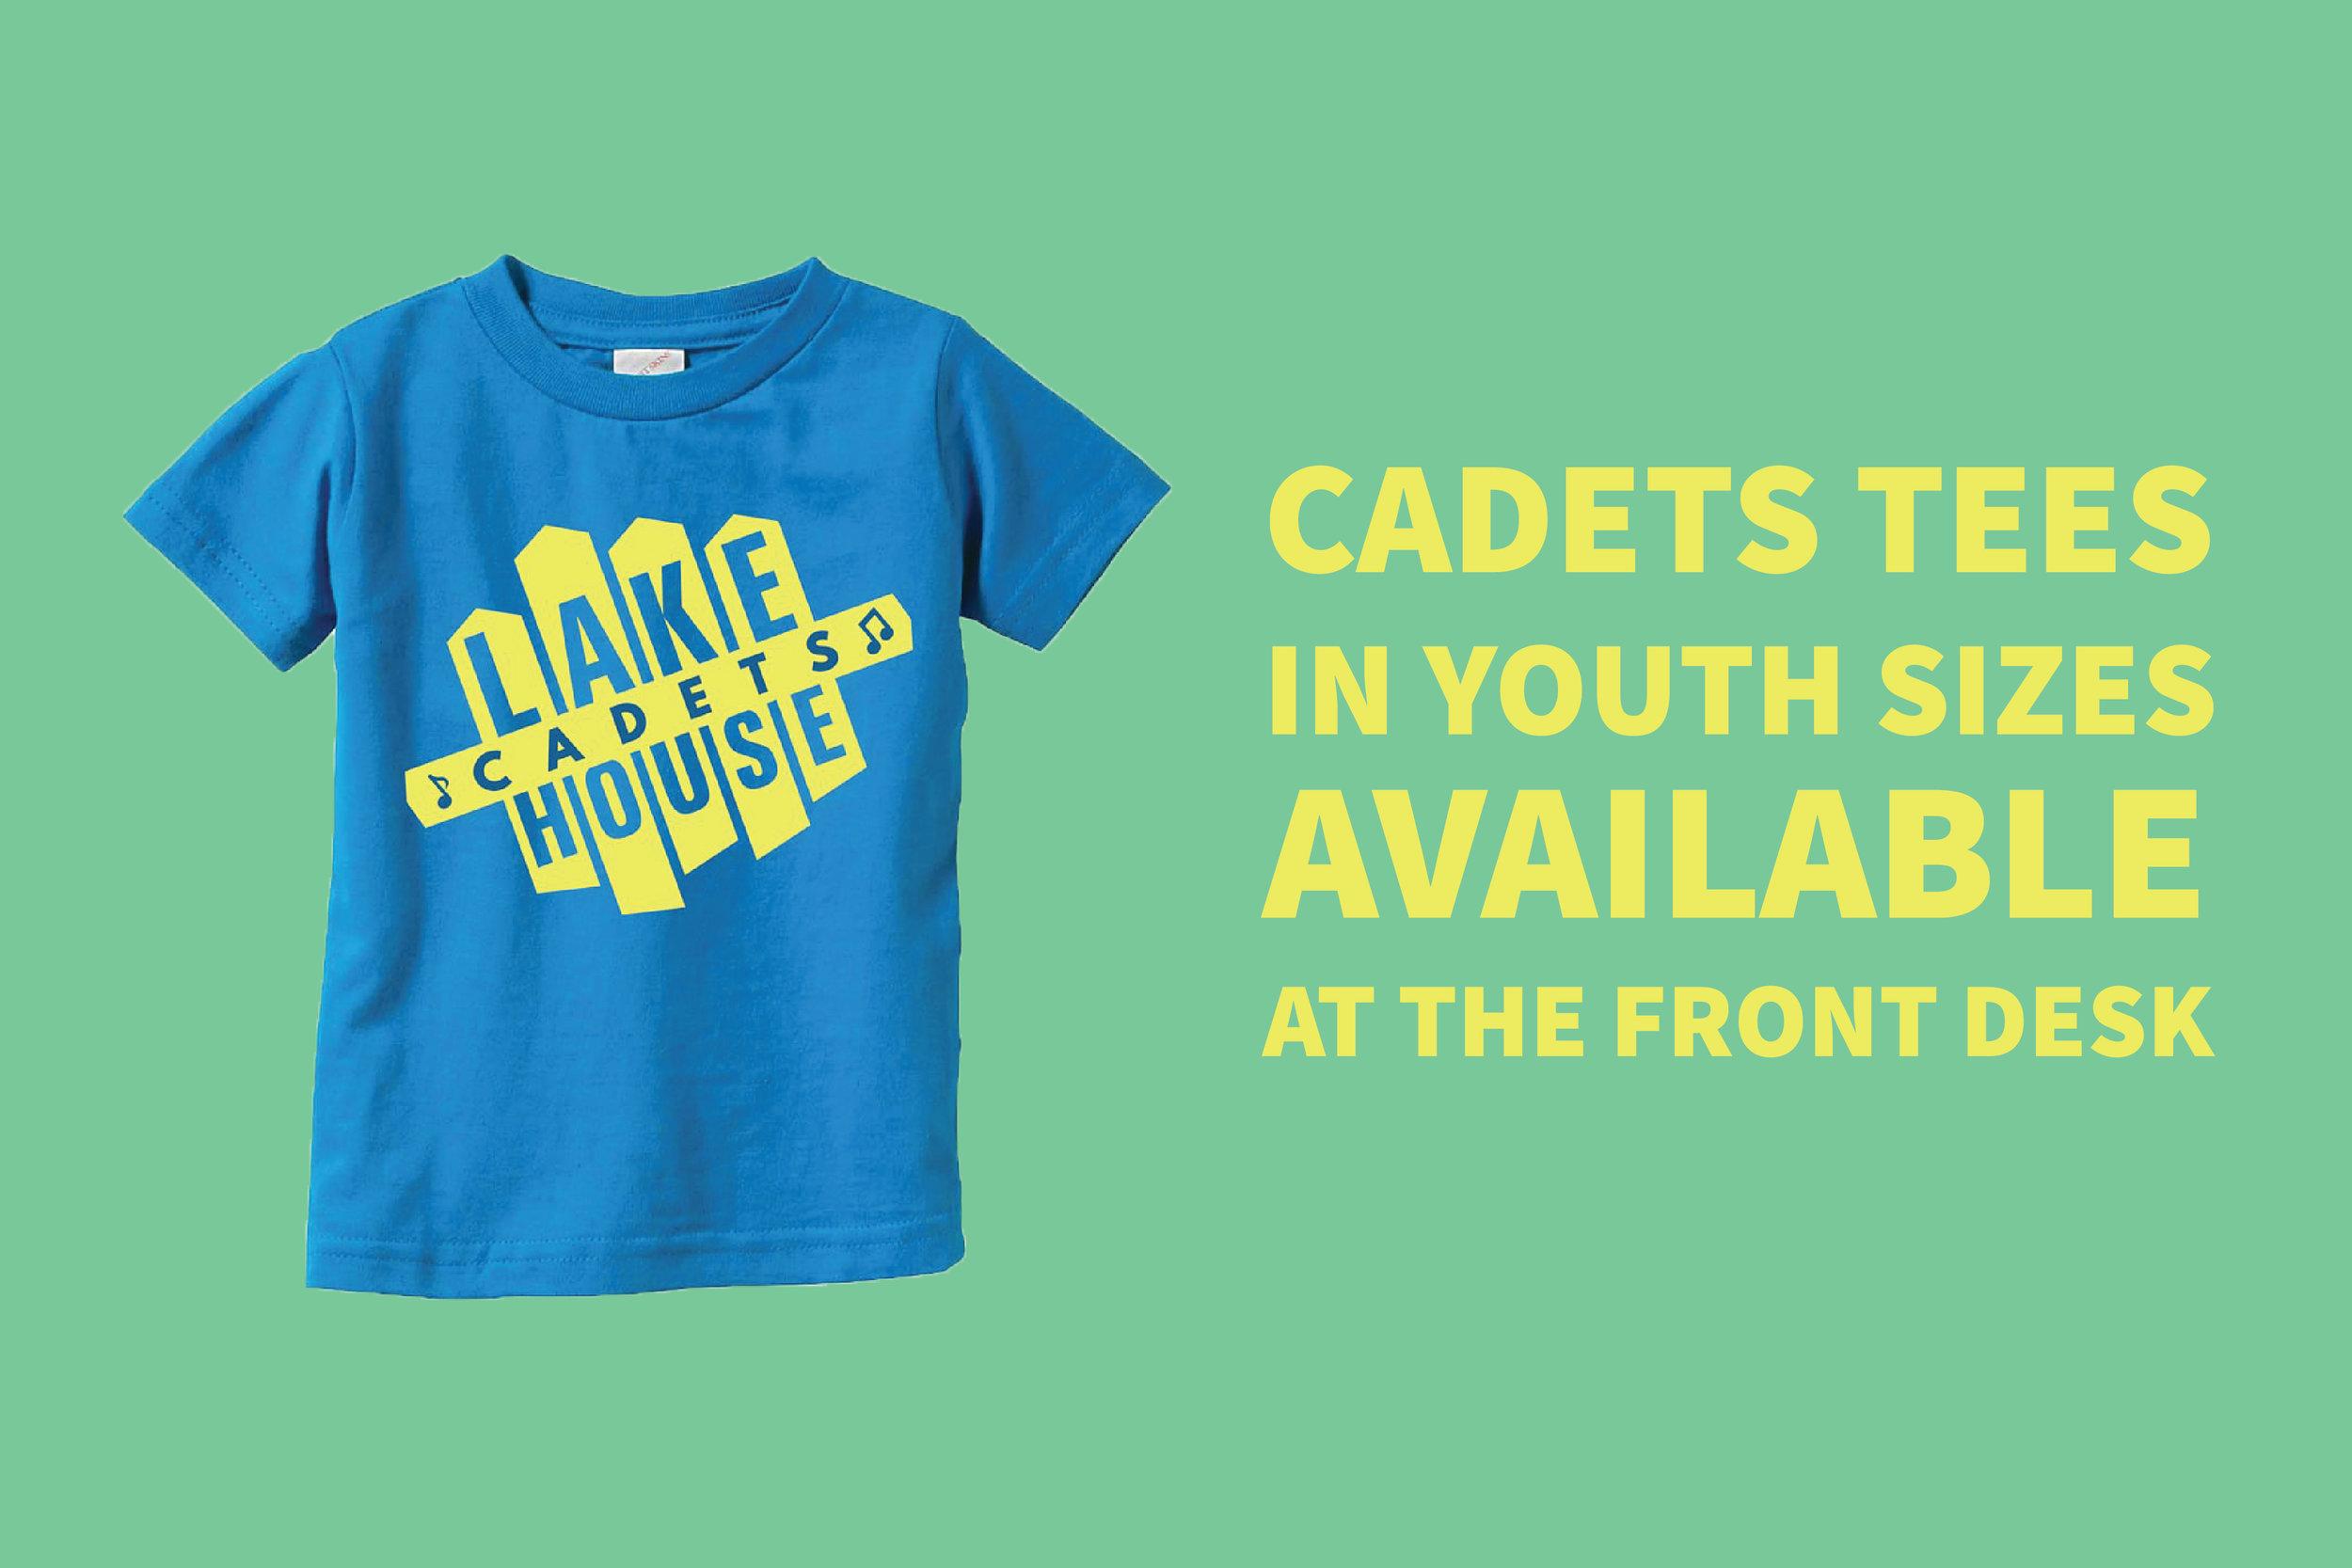 cadets_shirt_promo-01.jpg